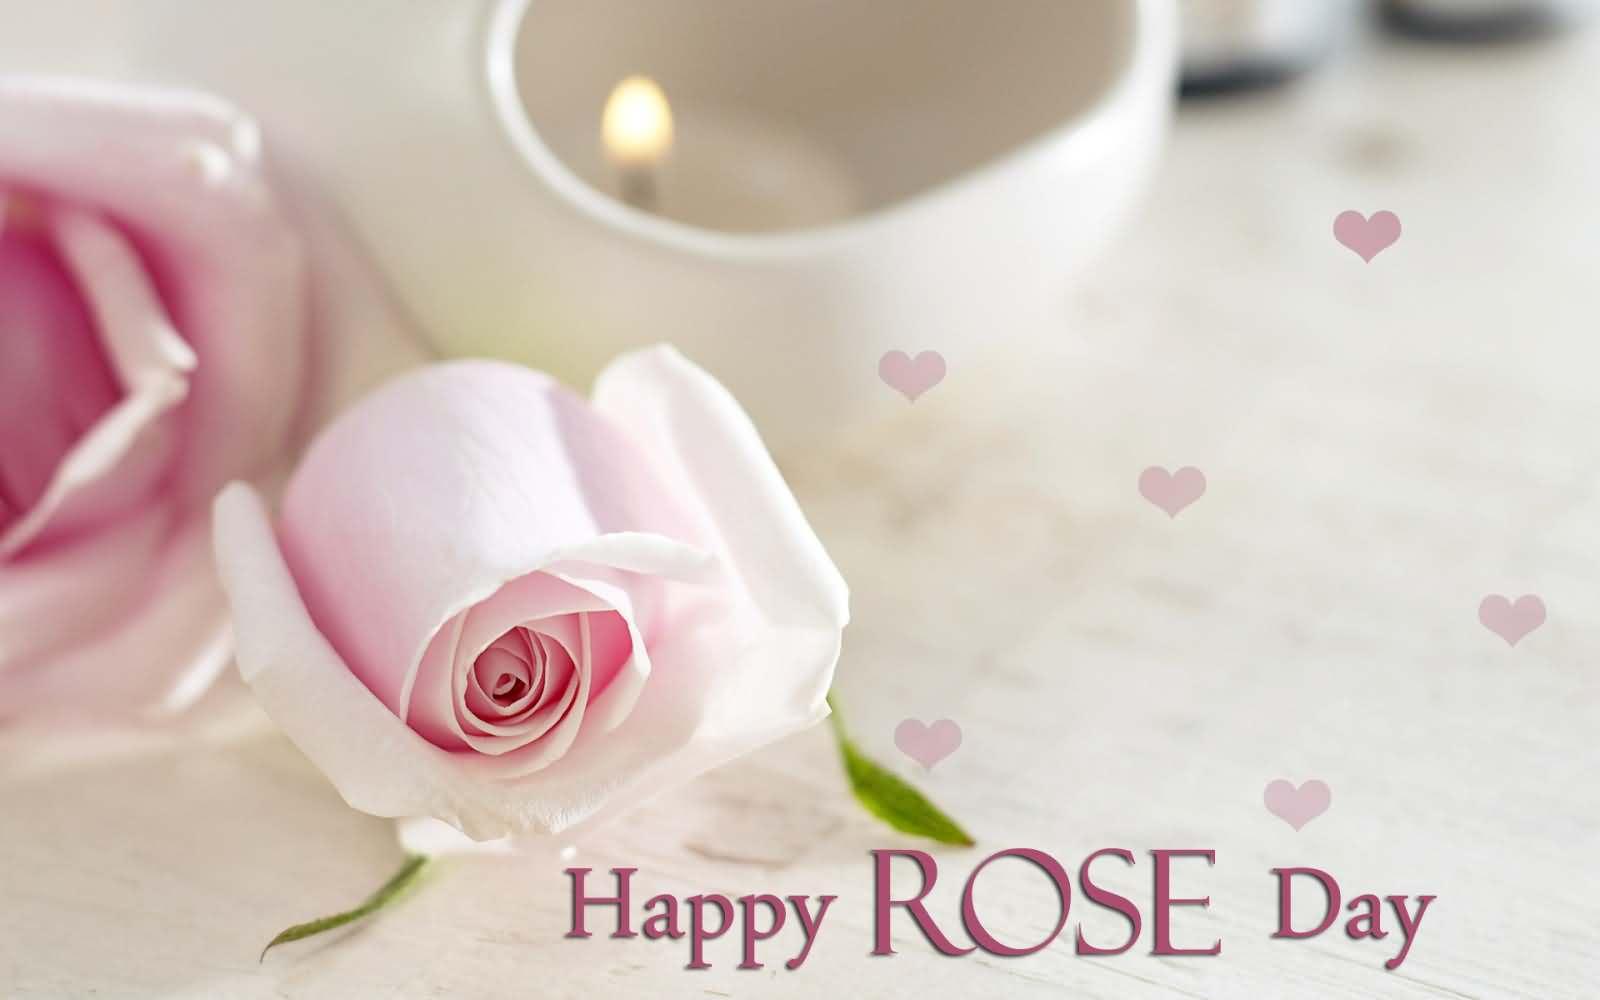 Happy rose day beautiful white roses flowers wallpaper mightylinksfo